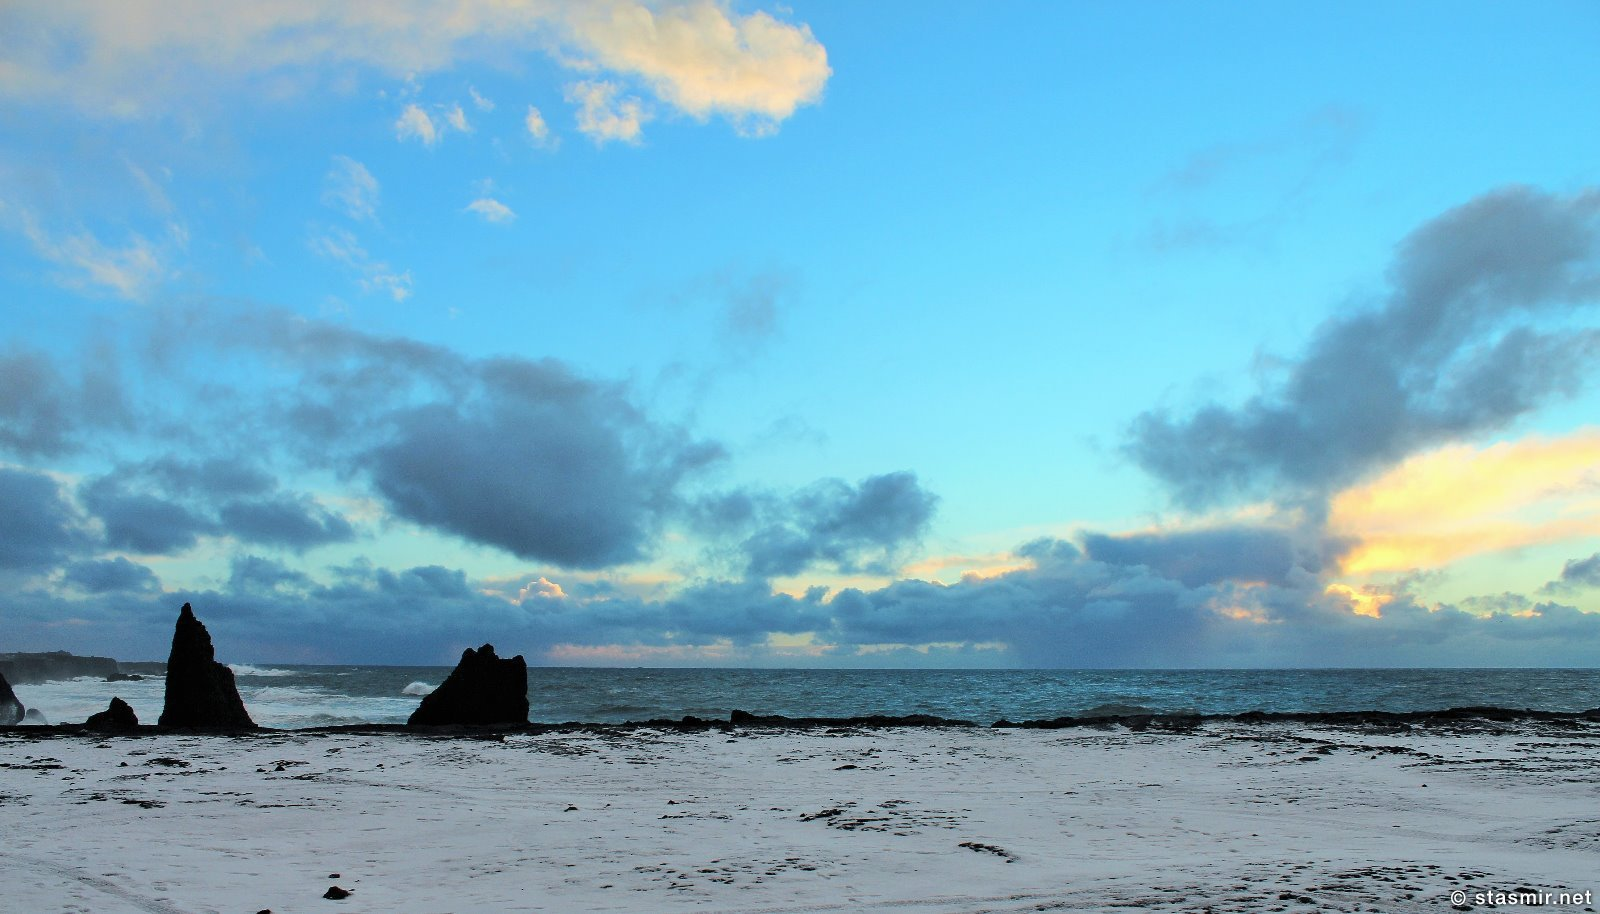 Скалы в районе Reykjanesviti, Исландия, фото Стасмир, photo Stasmir